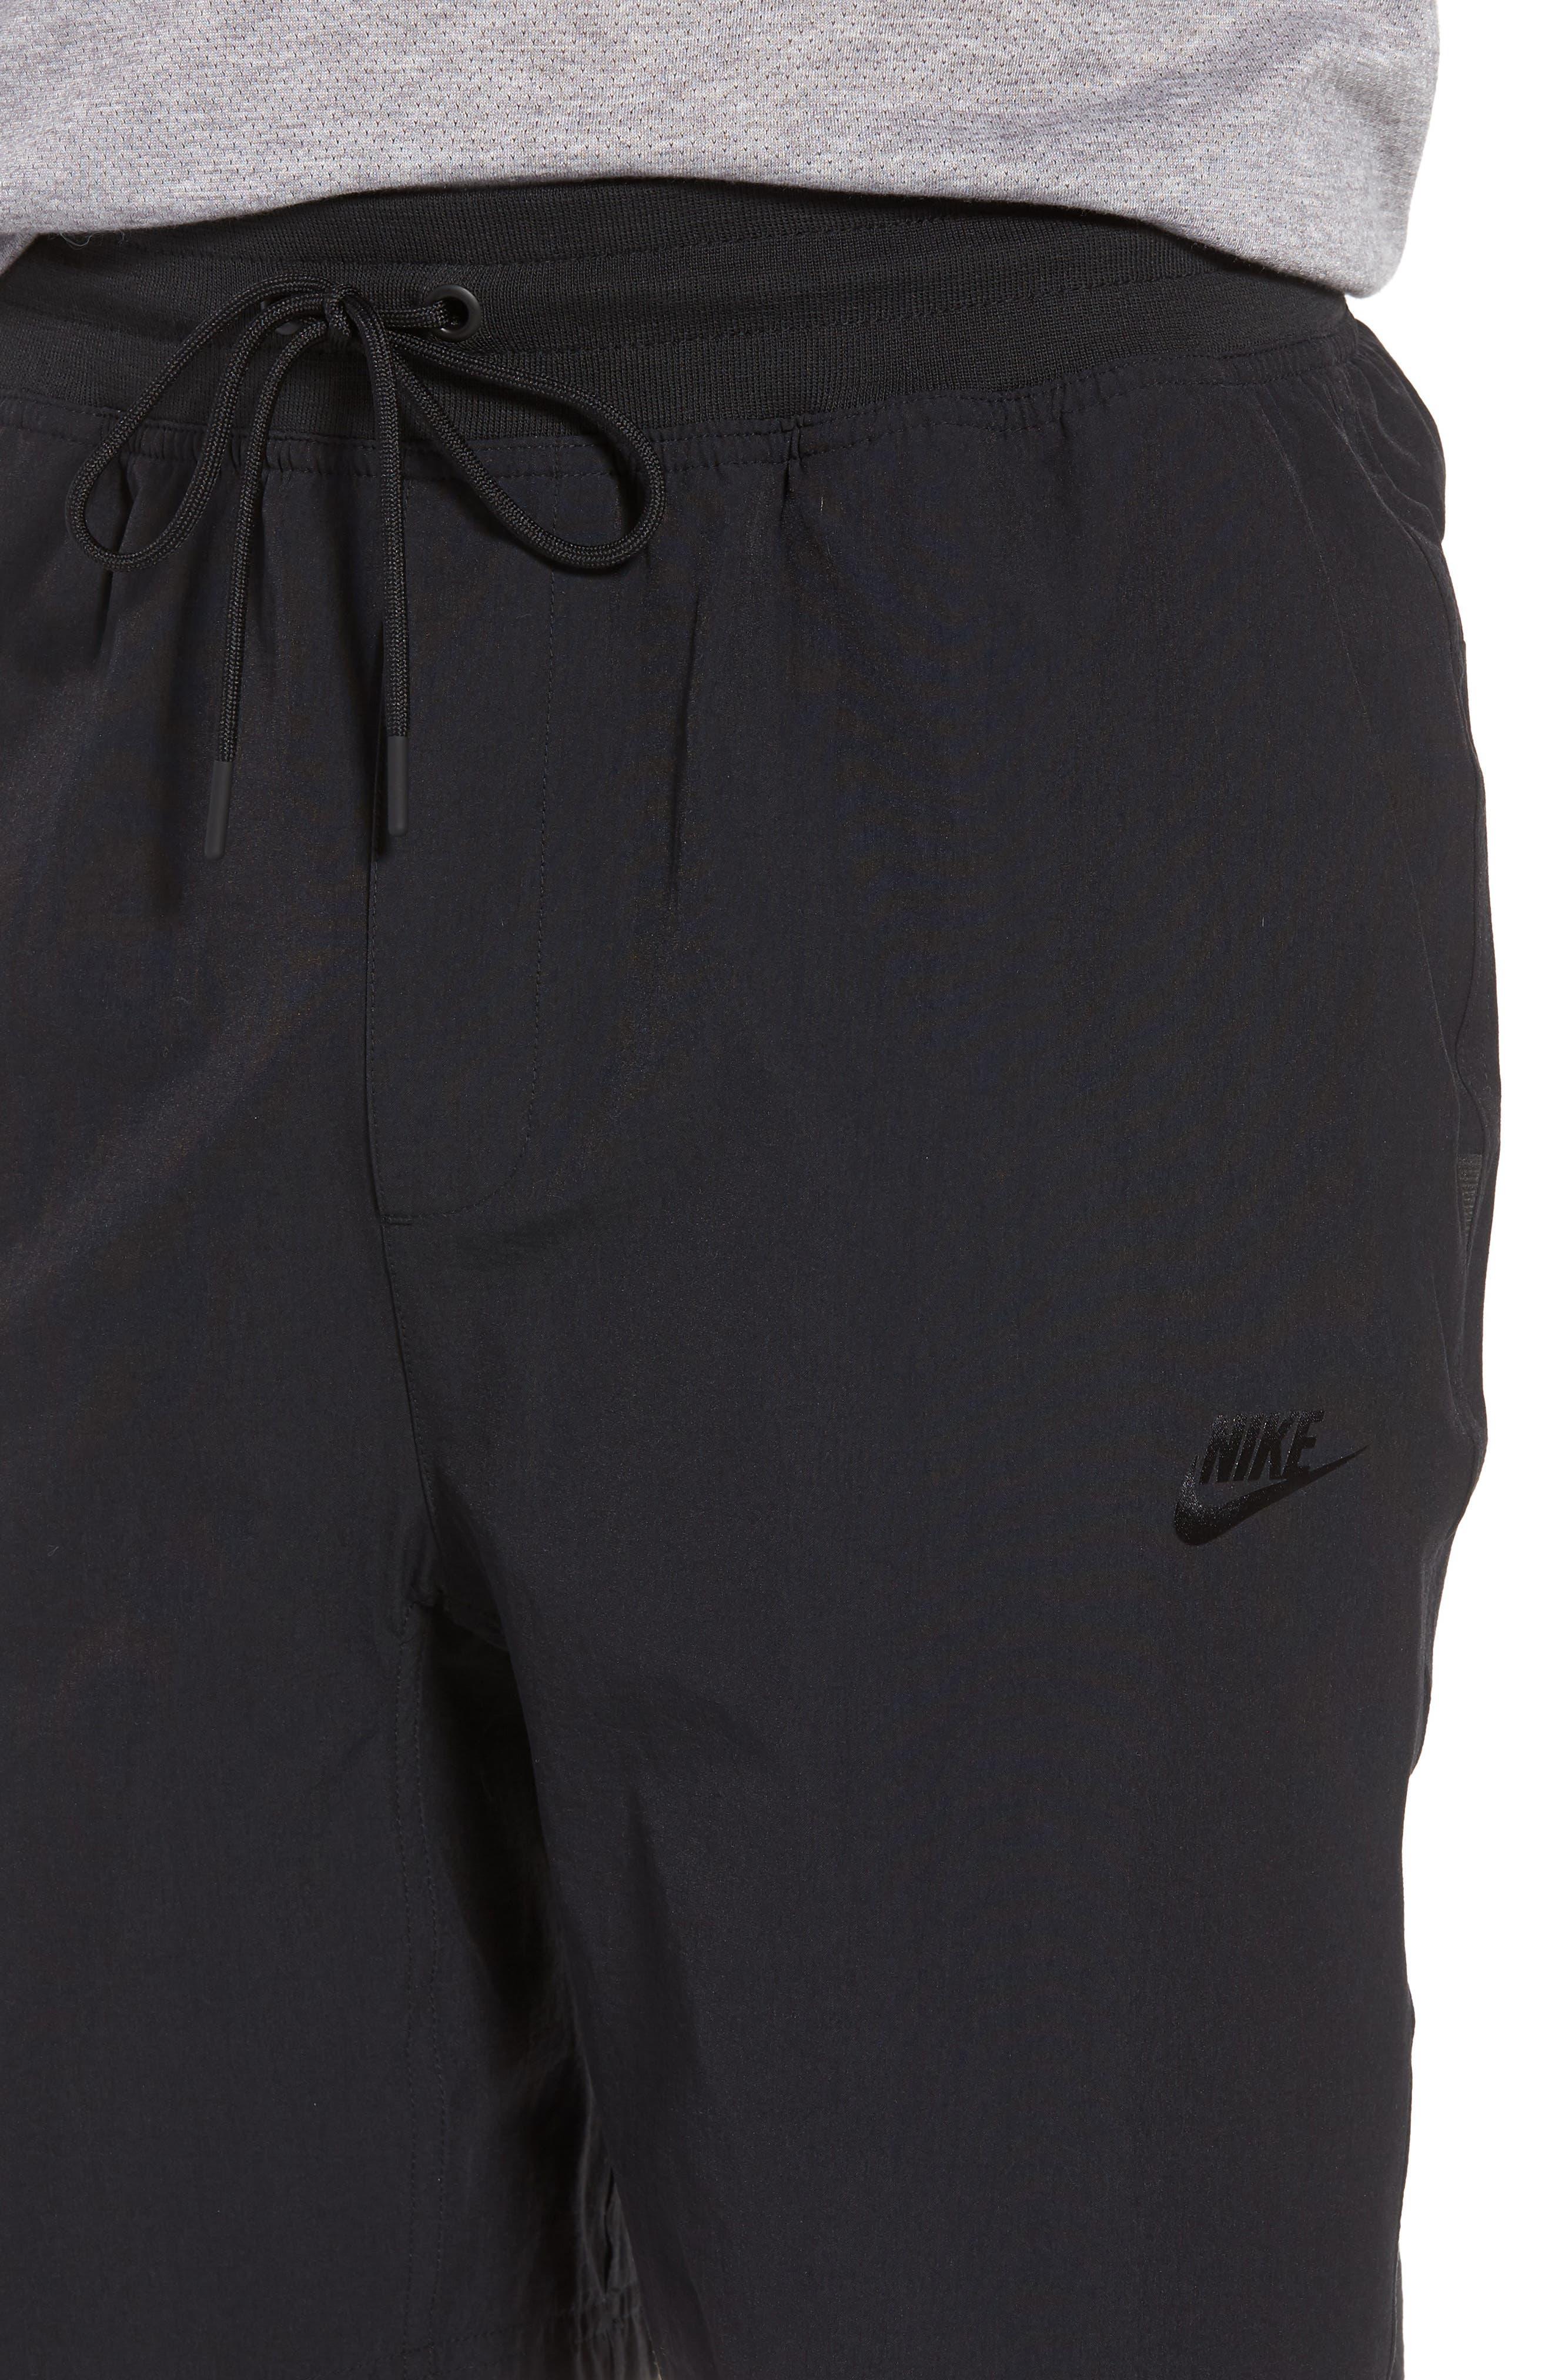 Sportswear Woven Shorts,                             Alternate thumbnail 4, color,                             Black/ Black